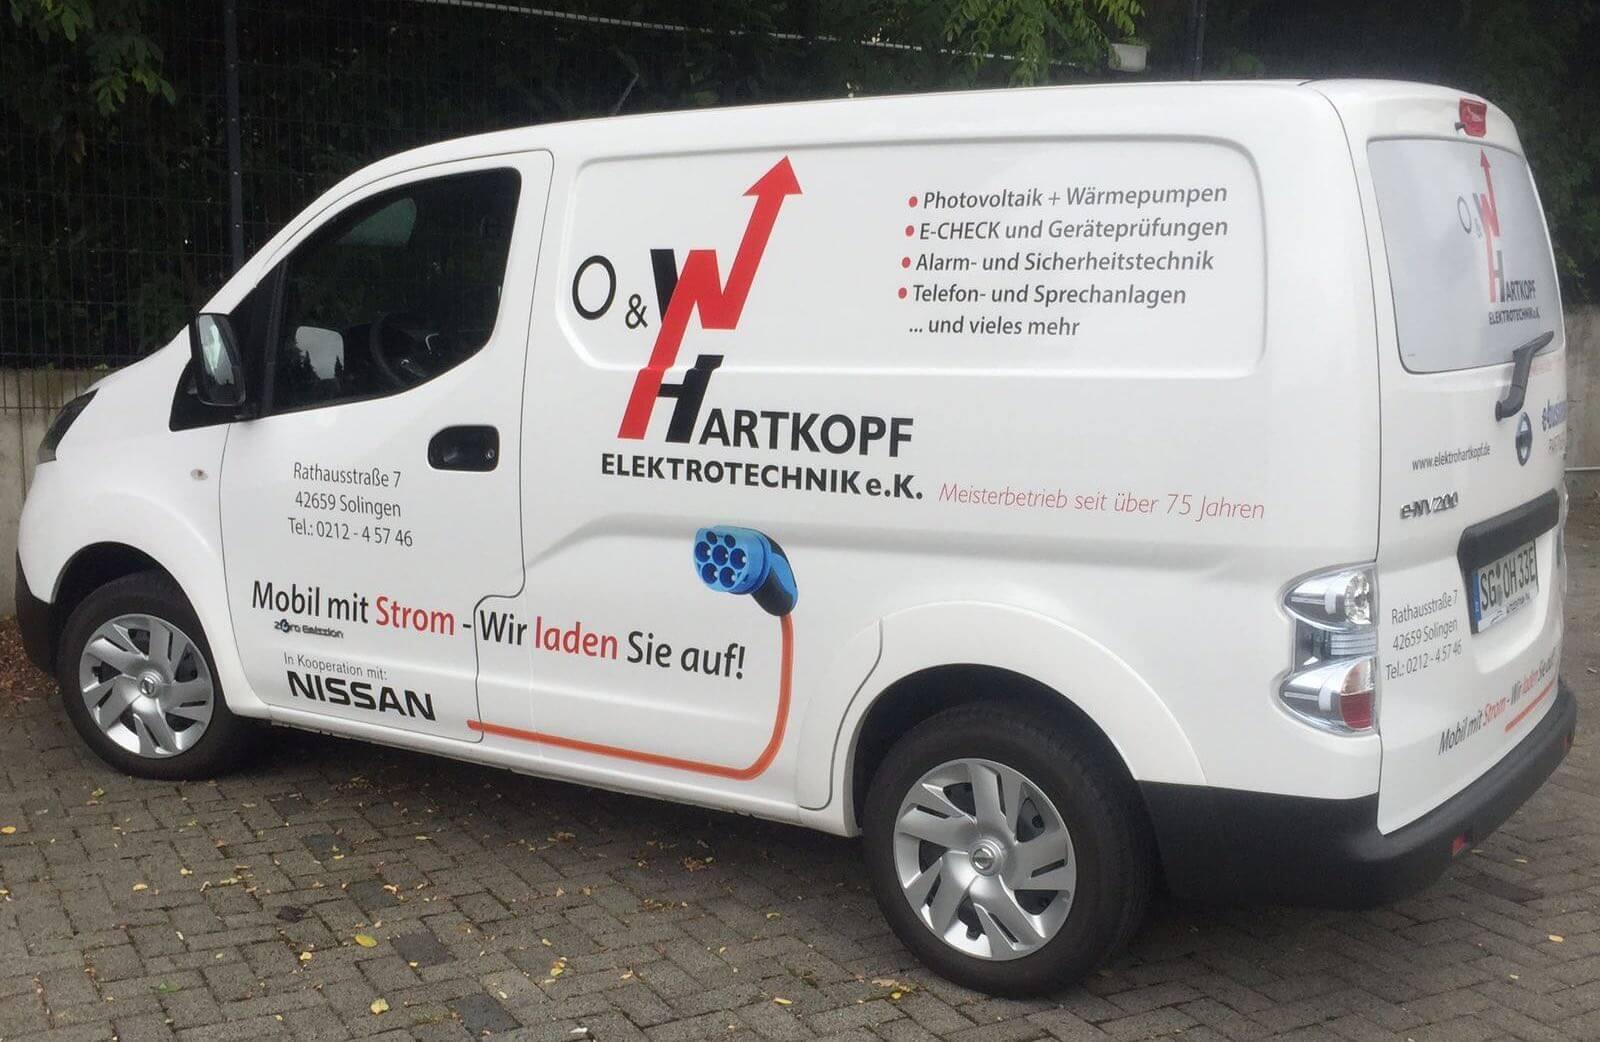 Elektrotechnikbetrieb Hartkopf Solingen